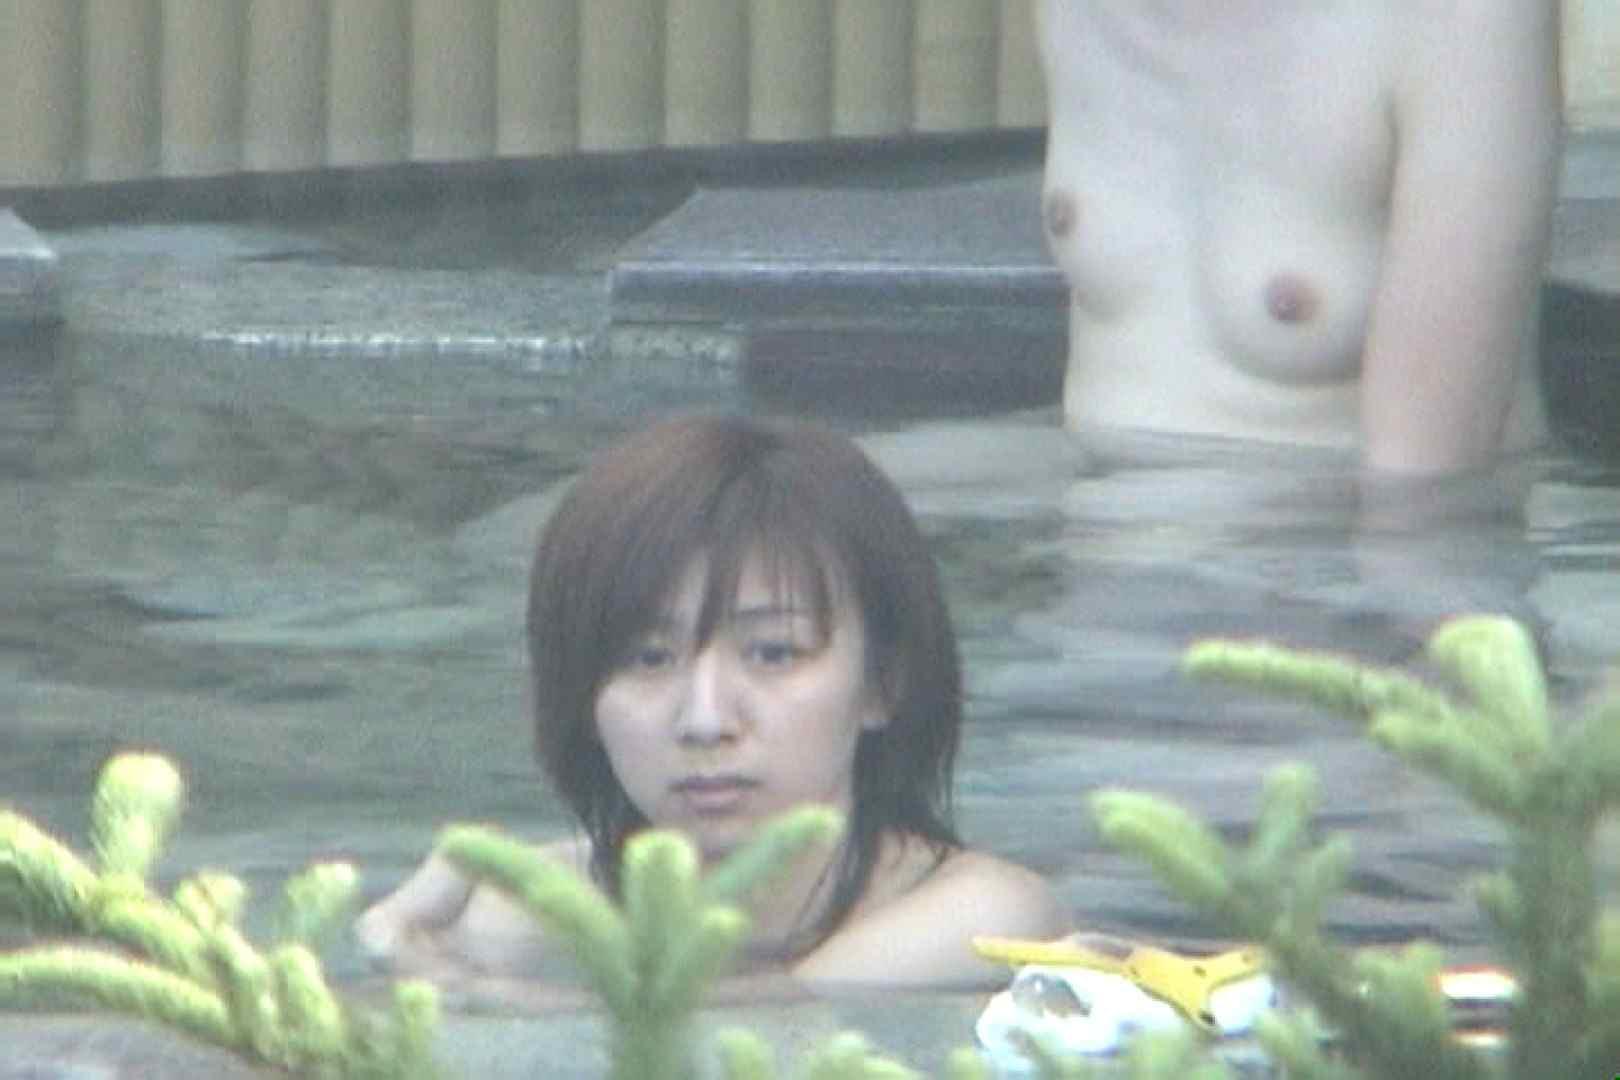 Aquaな露天風呂Vol.77【VIP限定】 露天   盗撮特集  98画像 68